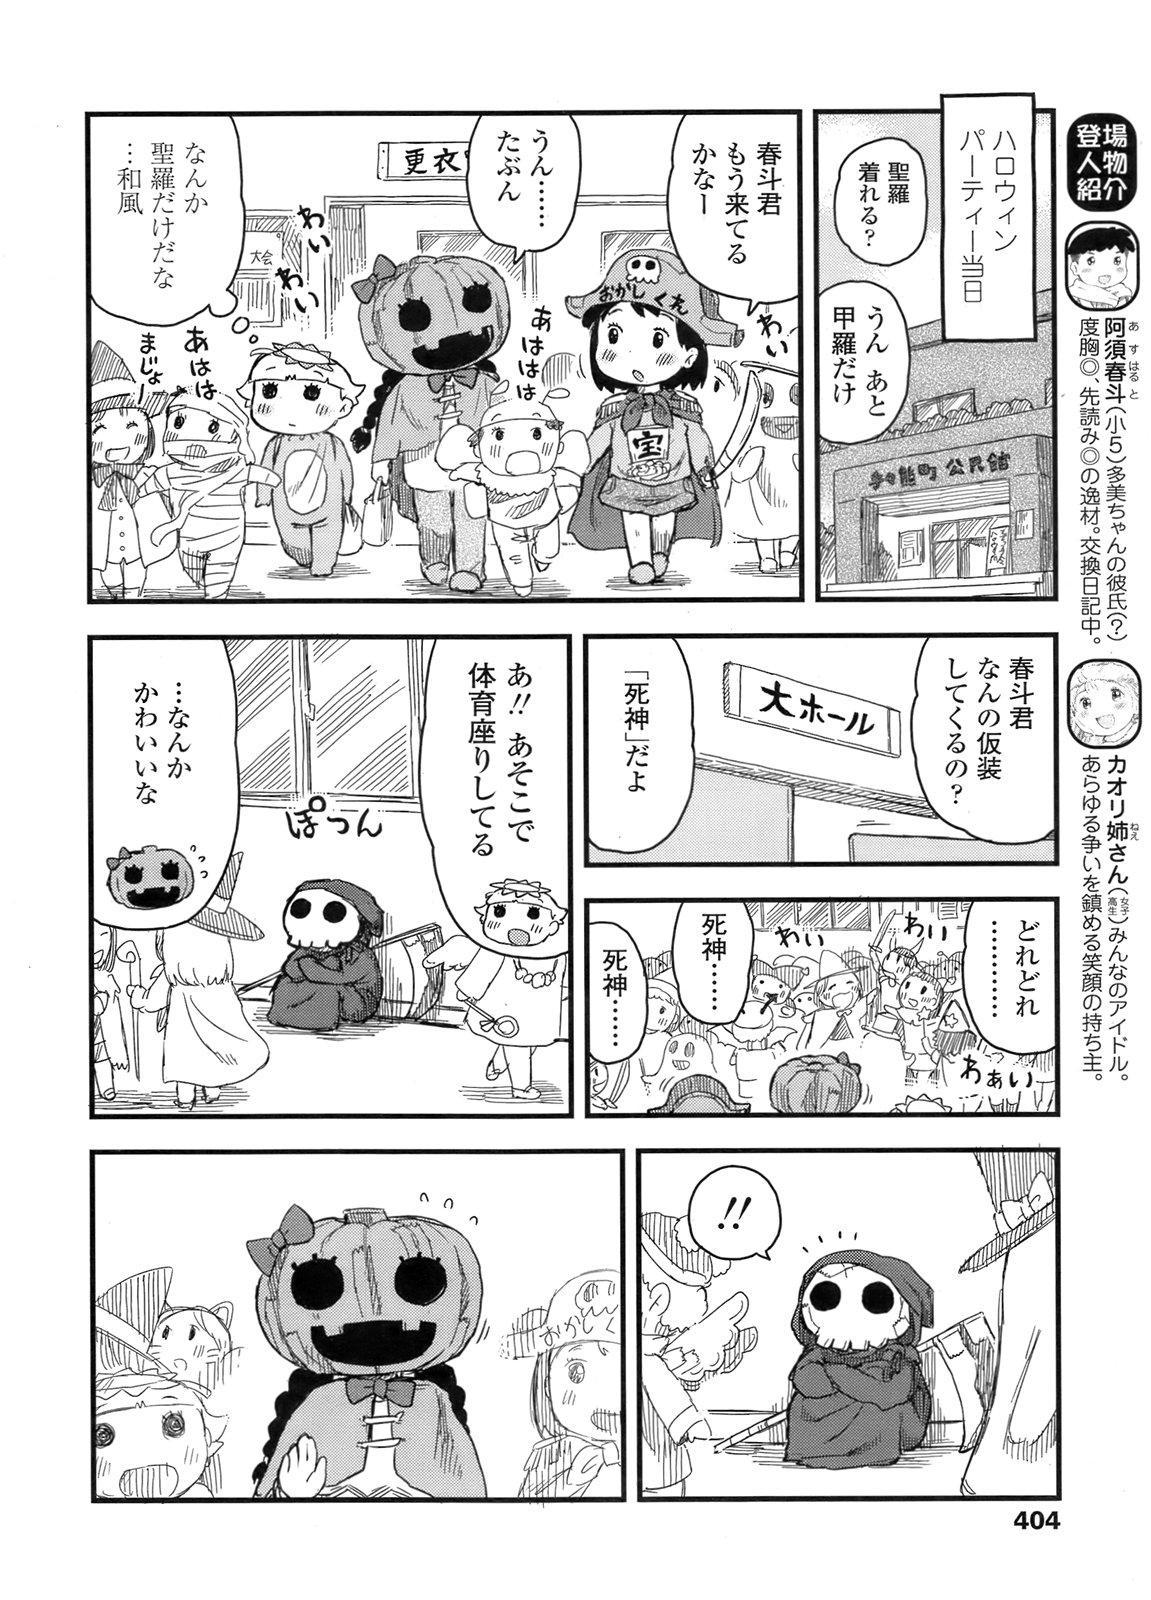 COMIC LO 2011-12 Vol. 93 404